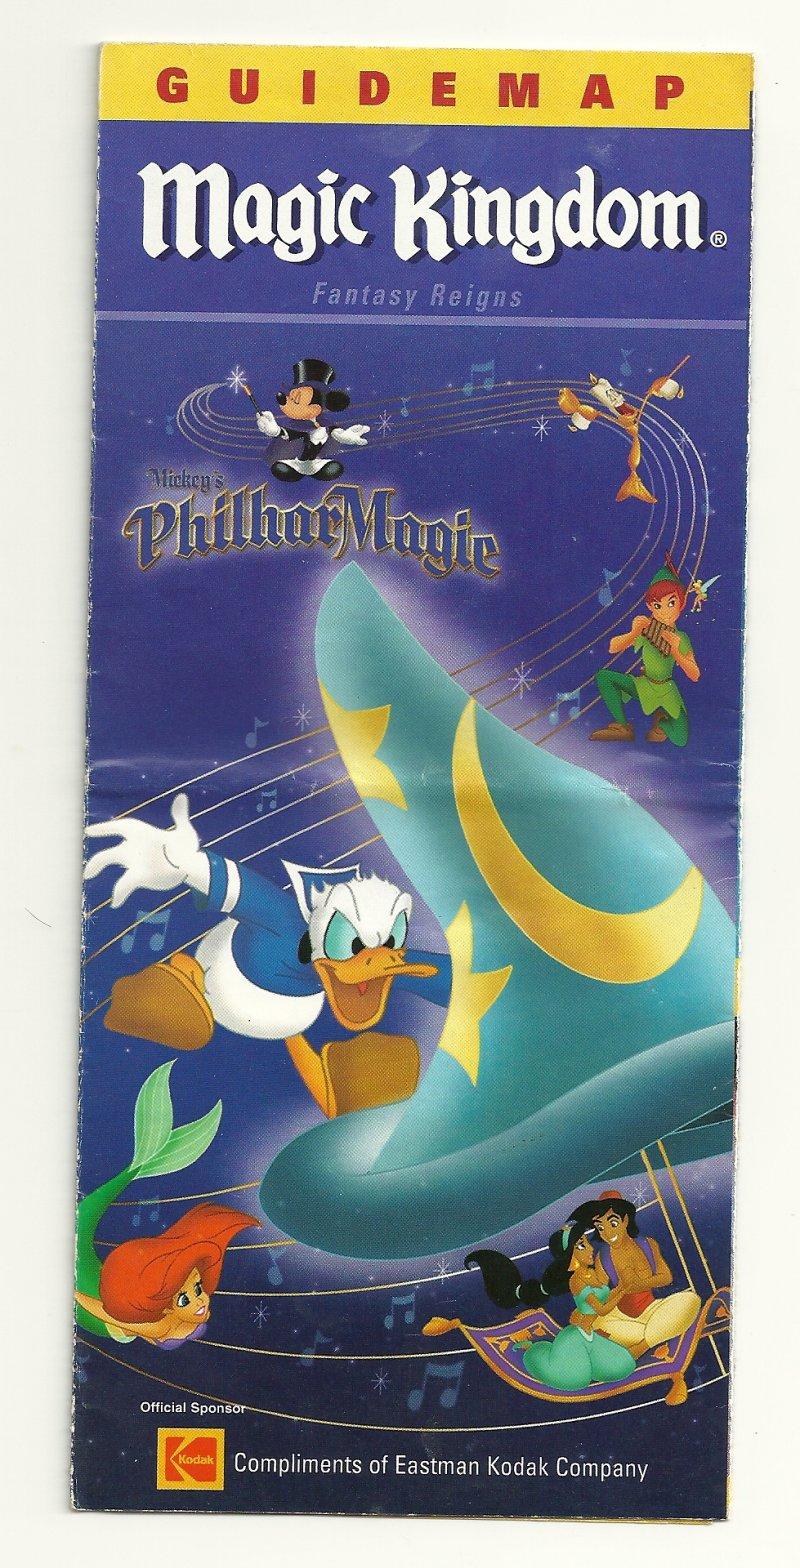 Image 0 of 2002 walt disney world Magic Kingdom Guide Map